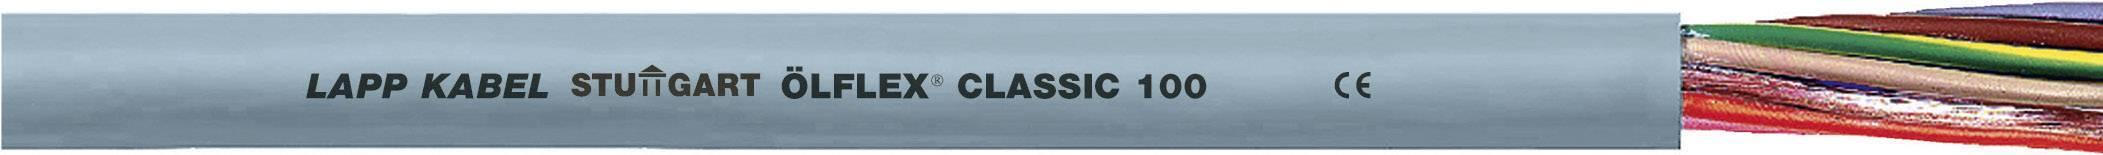 Kabel LappKabel Ölflex CLASSIC 100 10G0,5 (0010007), PVC, 8,6 mm, 500 V, šedá, 500 m